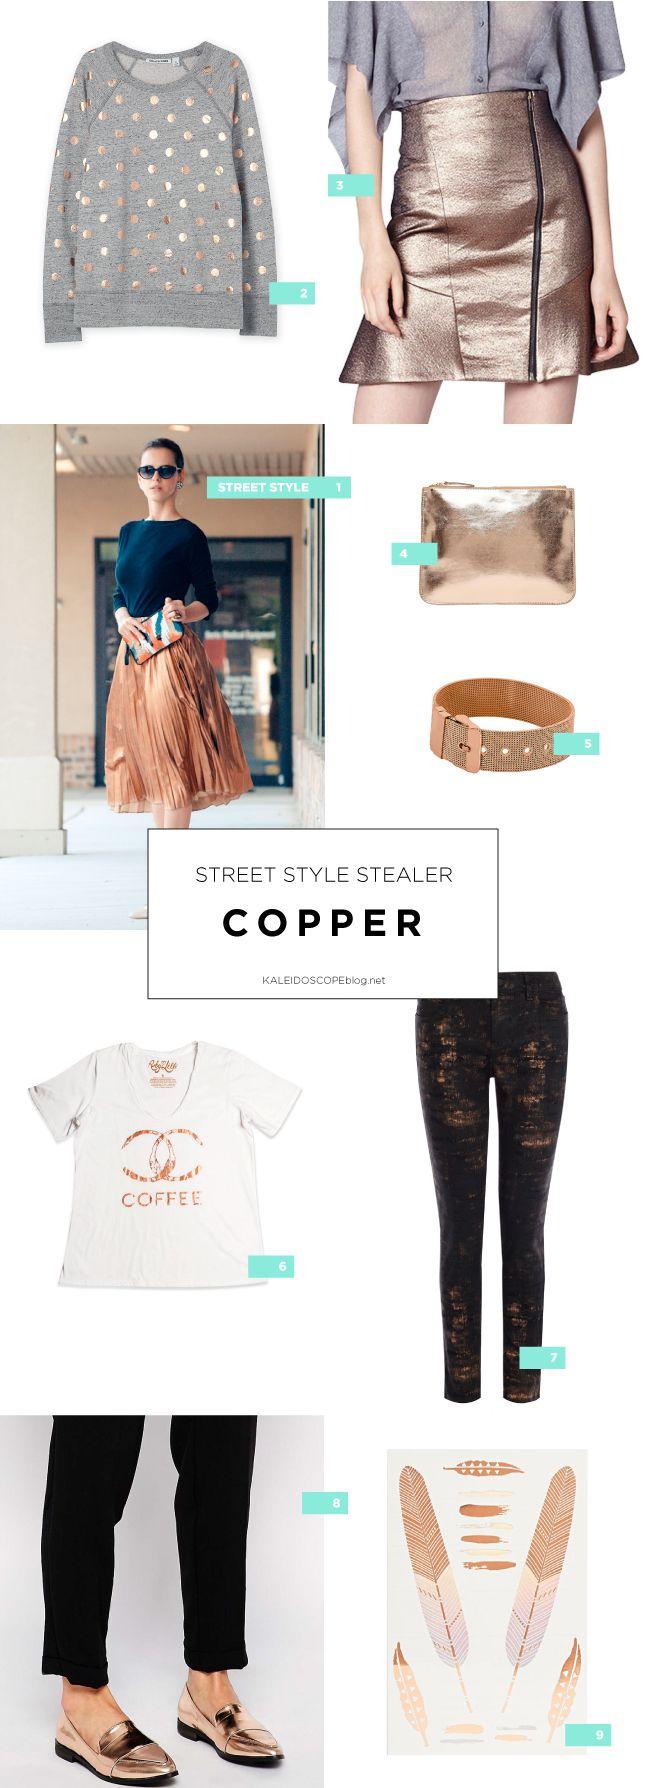 Street Style Stealer: Copper Fashion Inspiration Kaleidoscope Blog